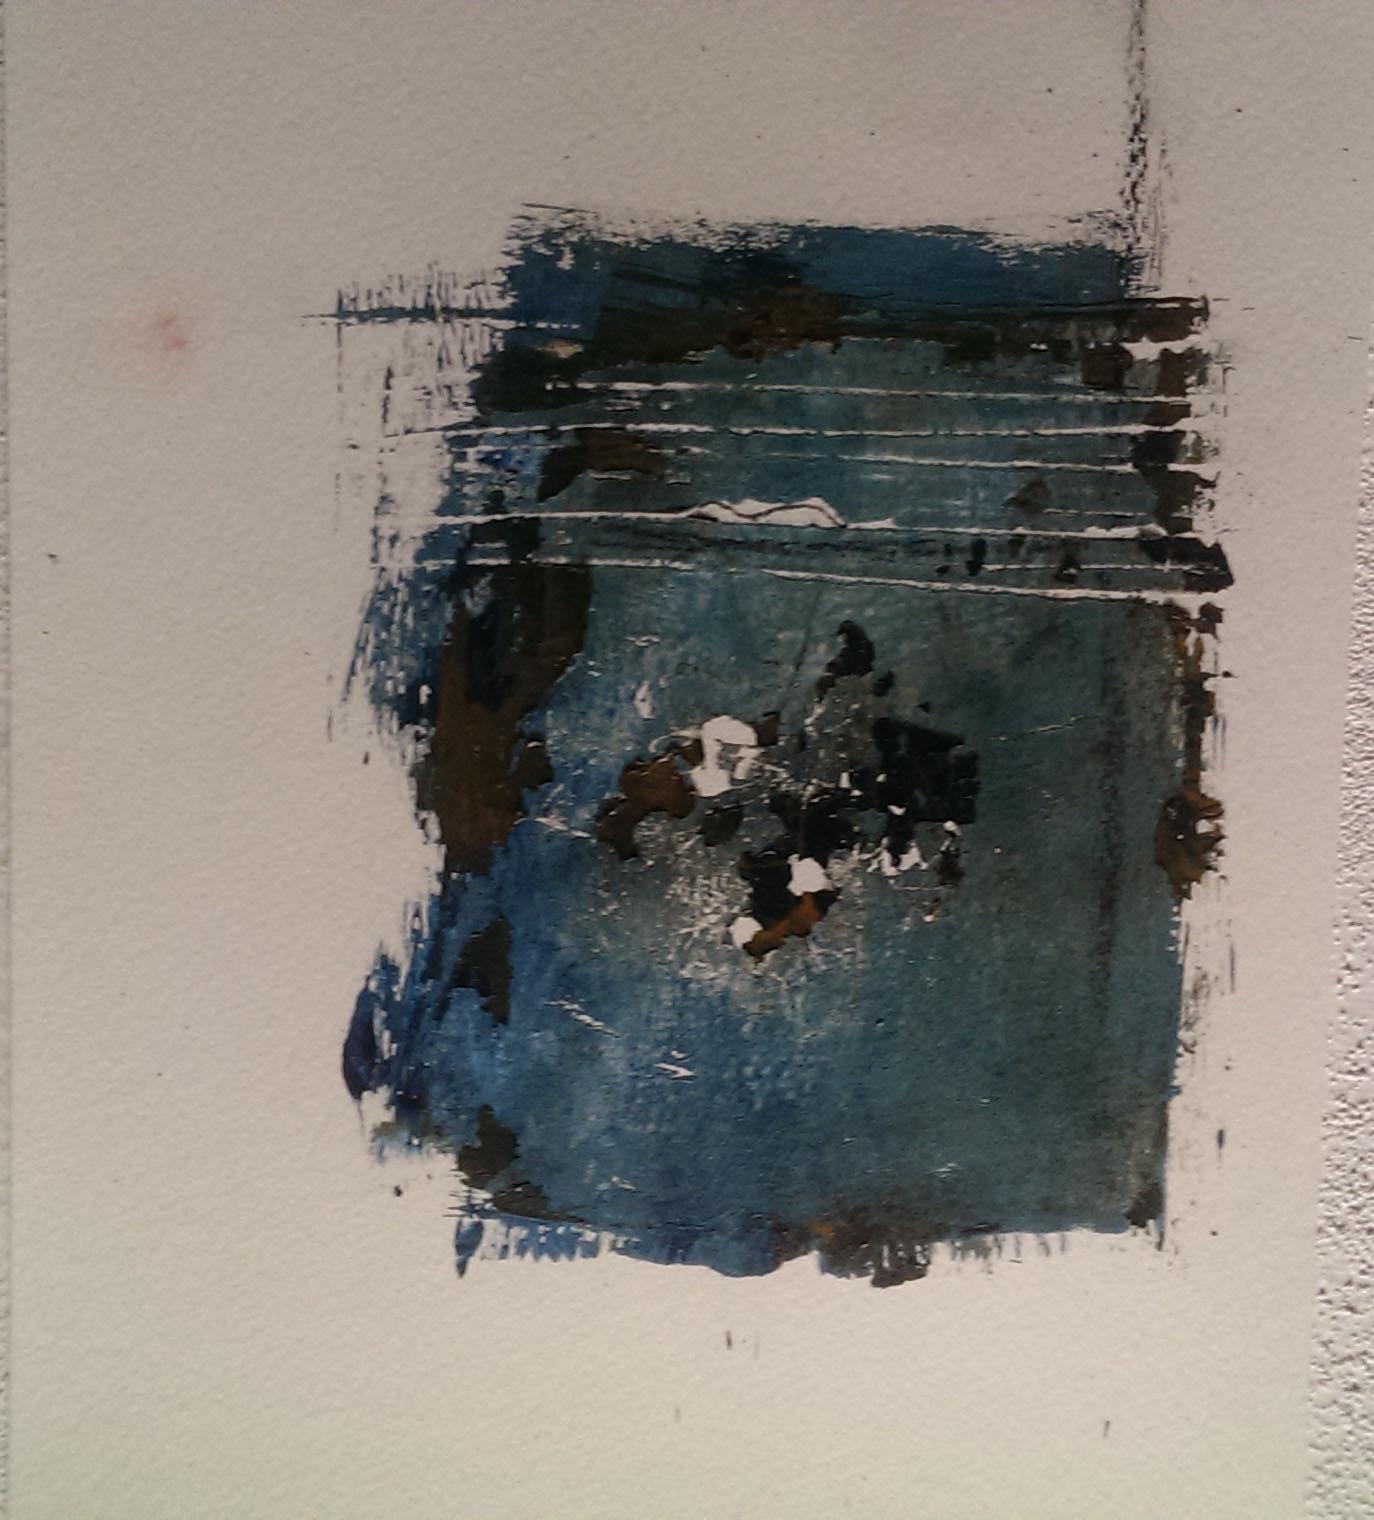 Marlies Meier-Freuken Malerei 3